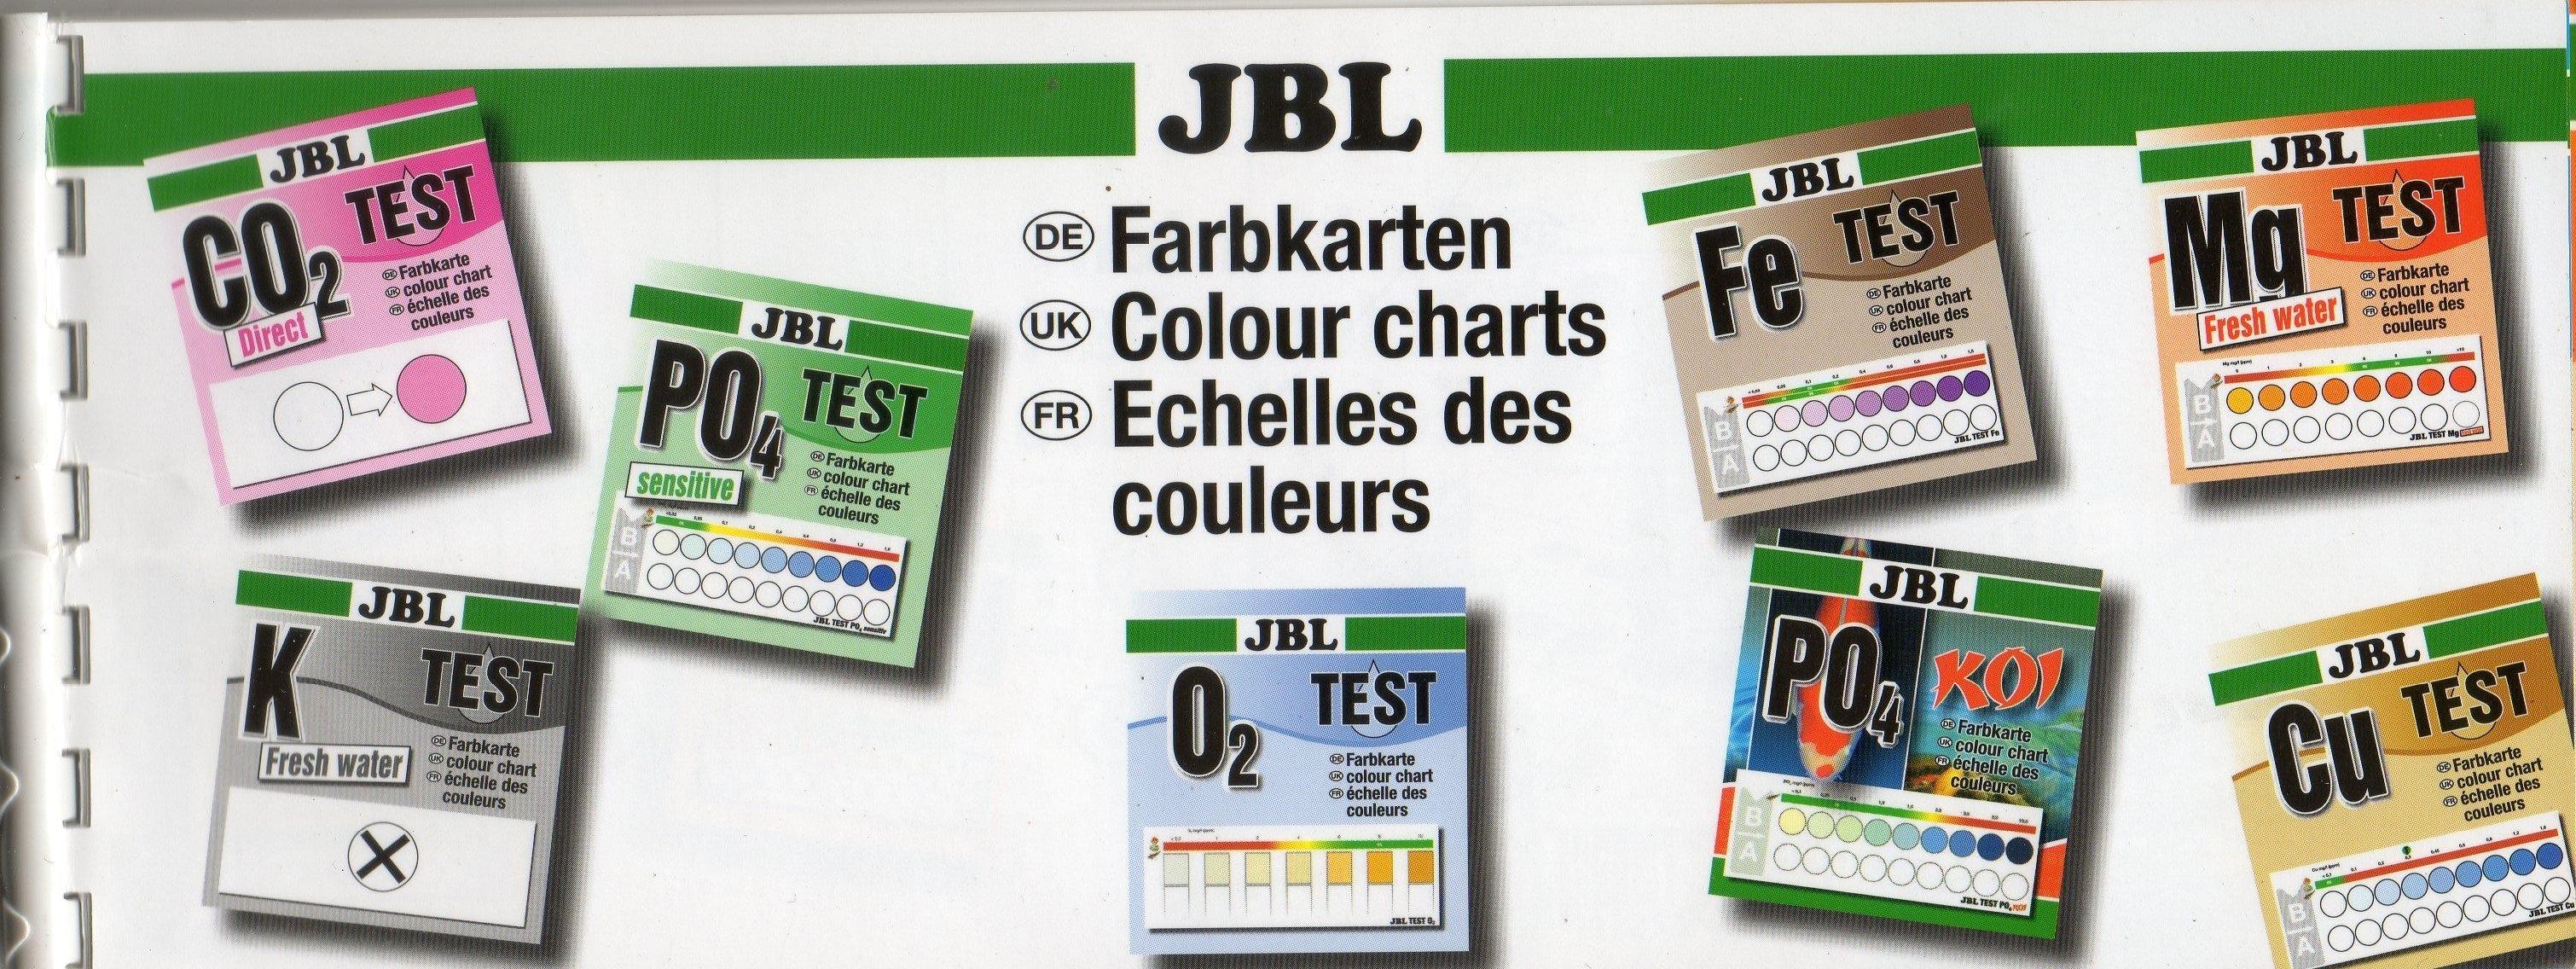 Nuancier Jbl test Vs Pro Aquatest 1572456414-test-jbl